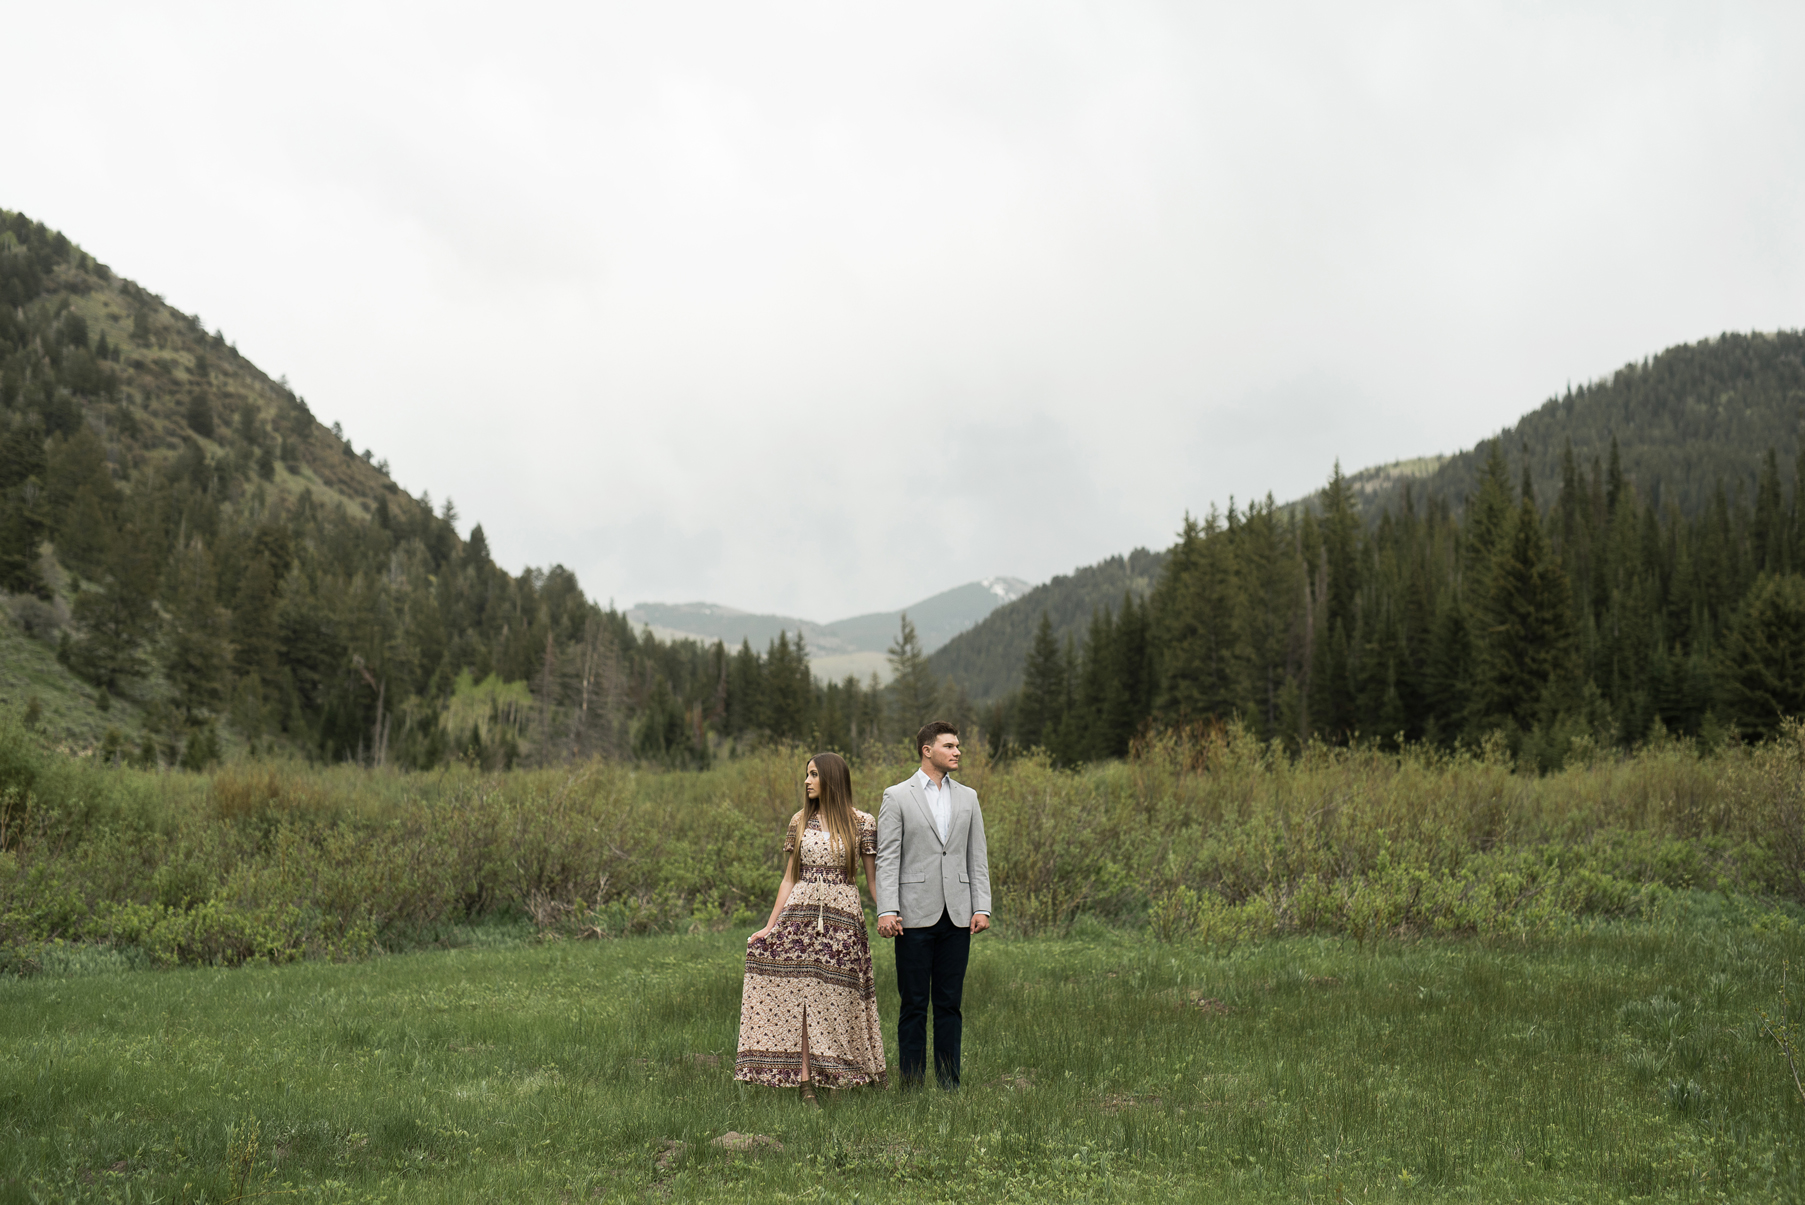 bohemian engagements big cottonwood canyon utah